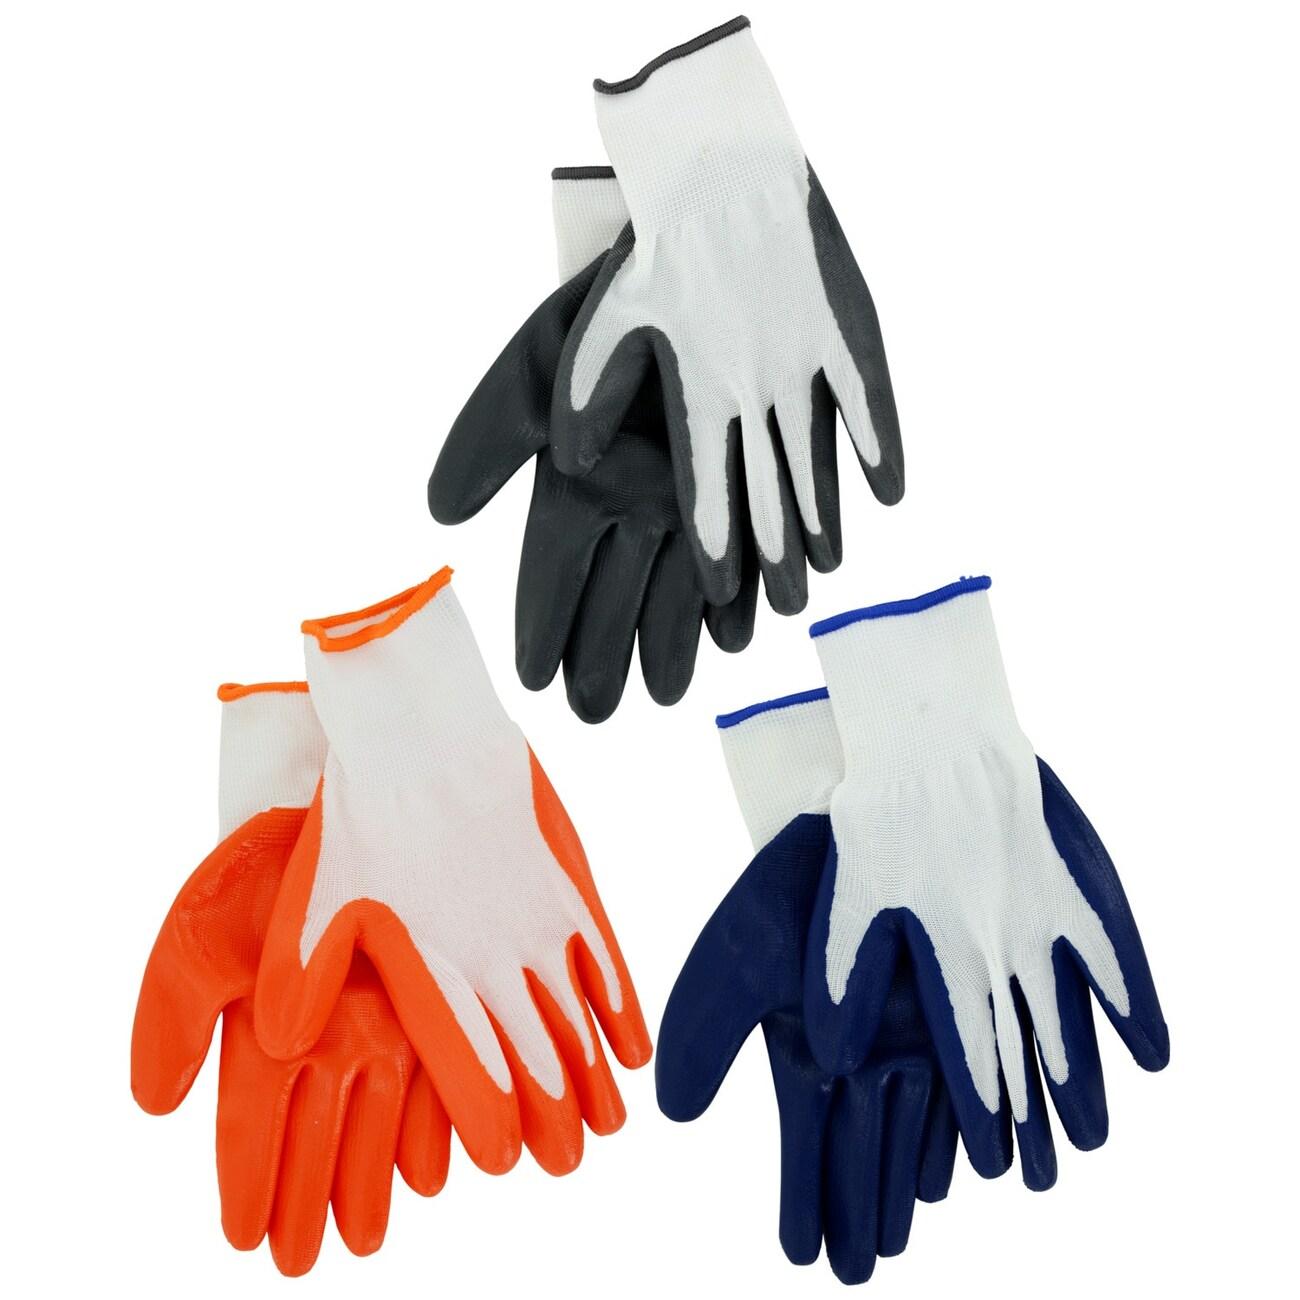 Tool Bench Gloves Dollar Tree Inc